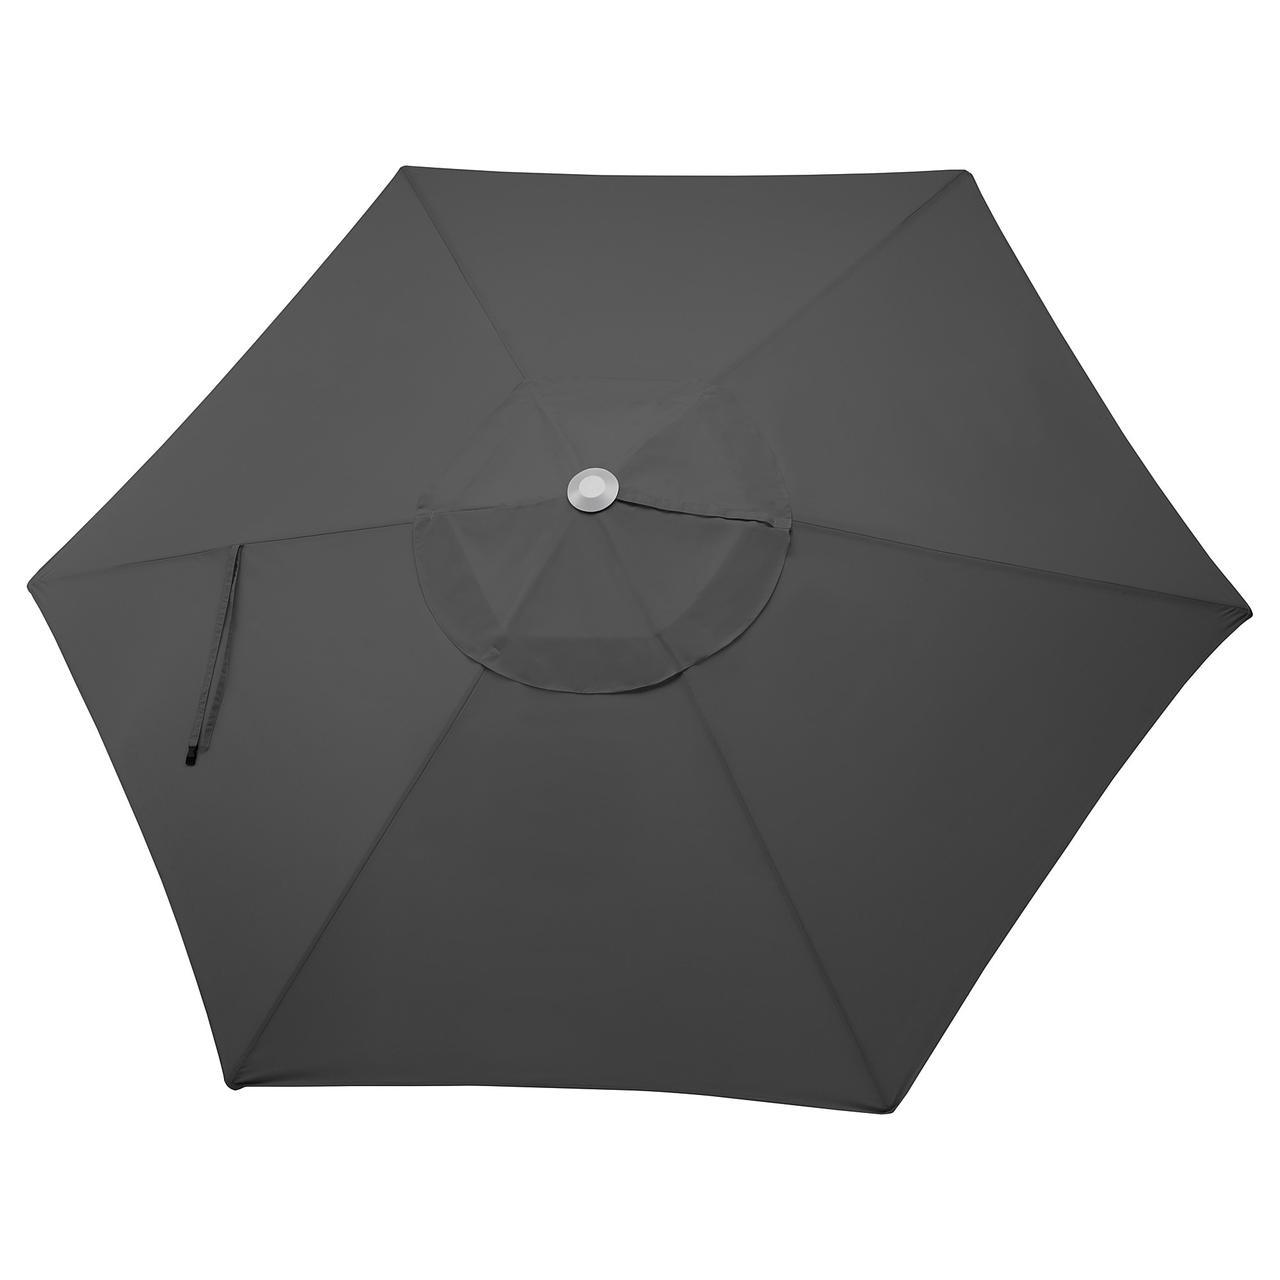 ЛИНДЭЙА Купол зонта от солнца, черный